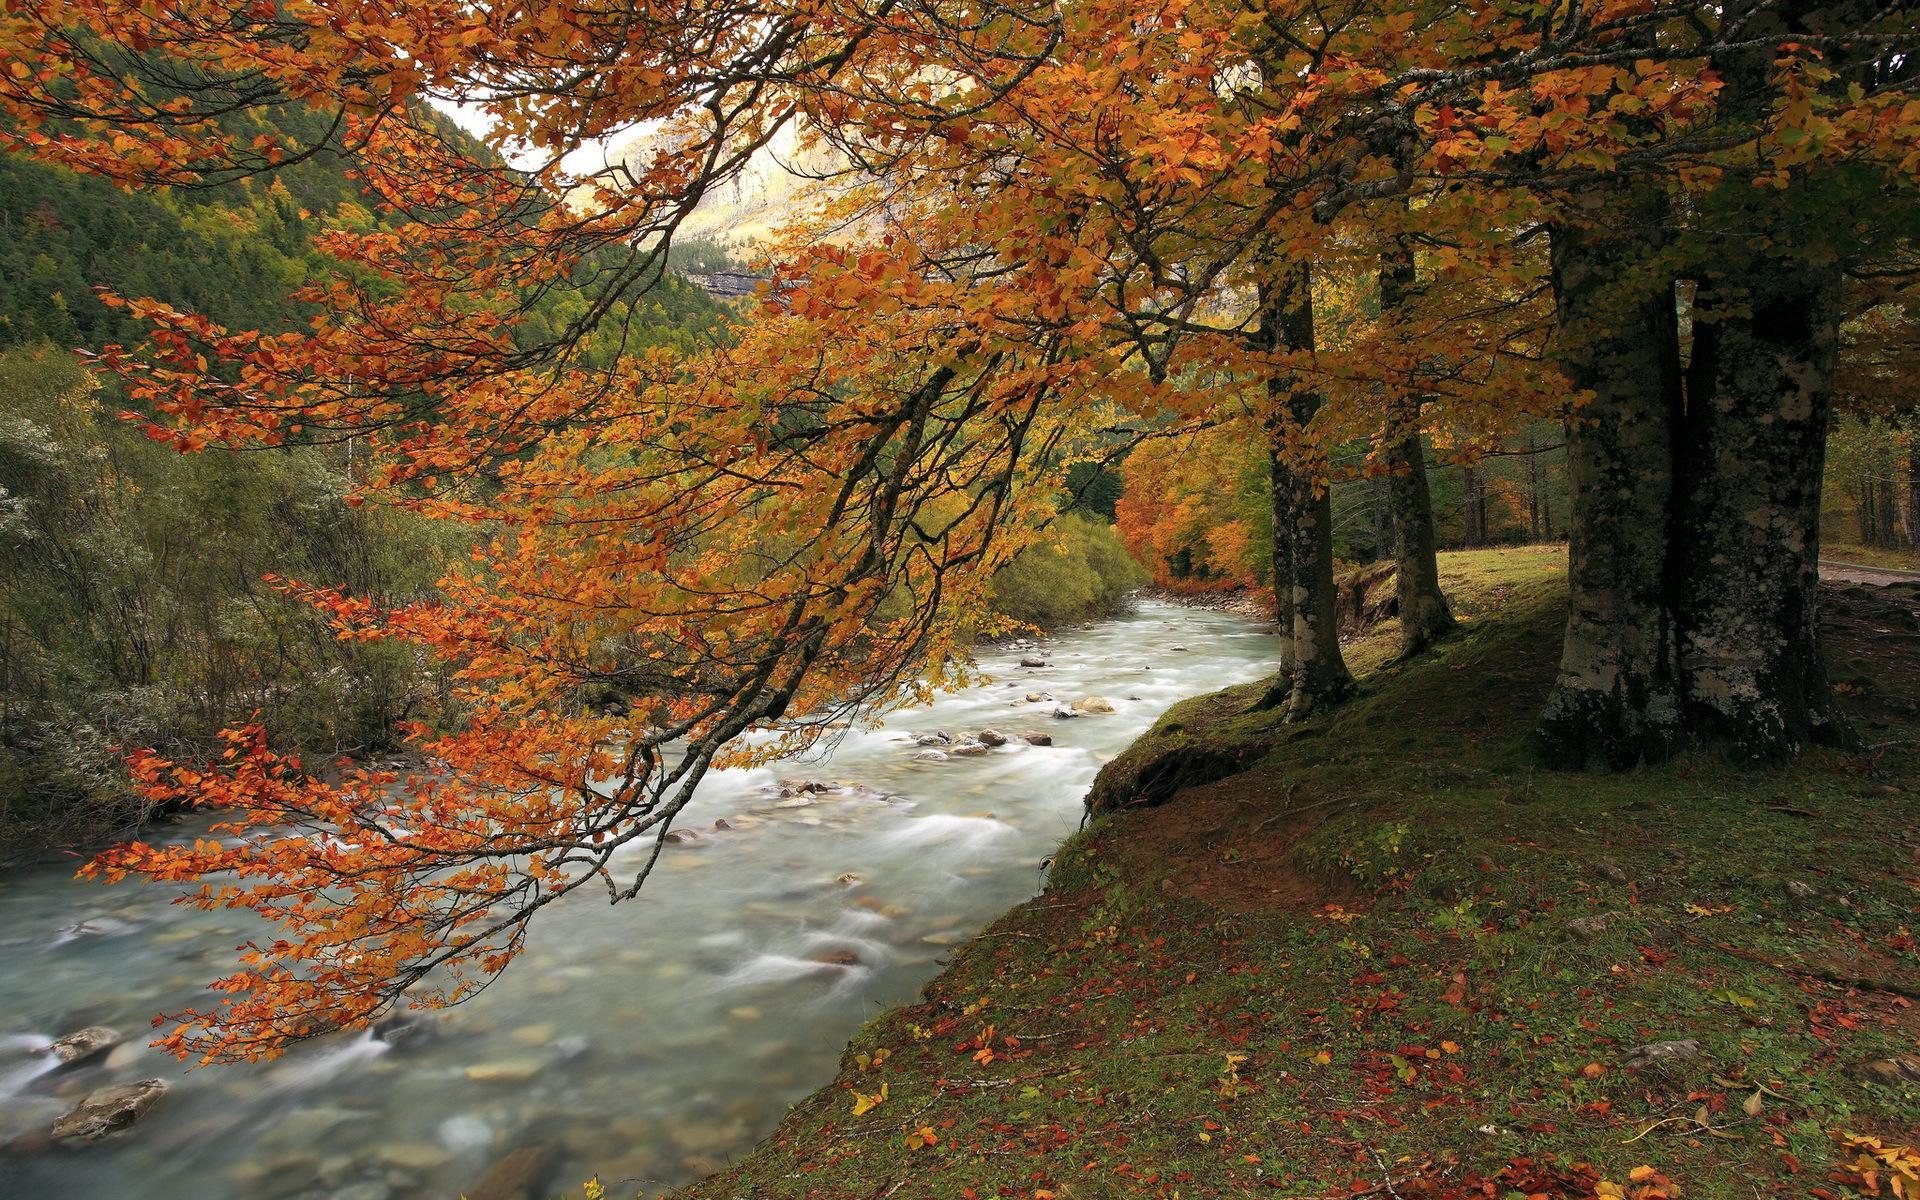 autumn nature river - photo #41